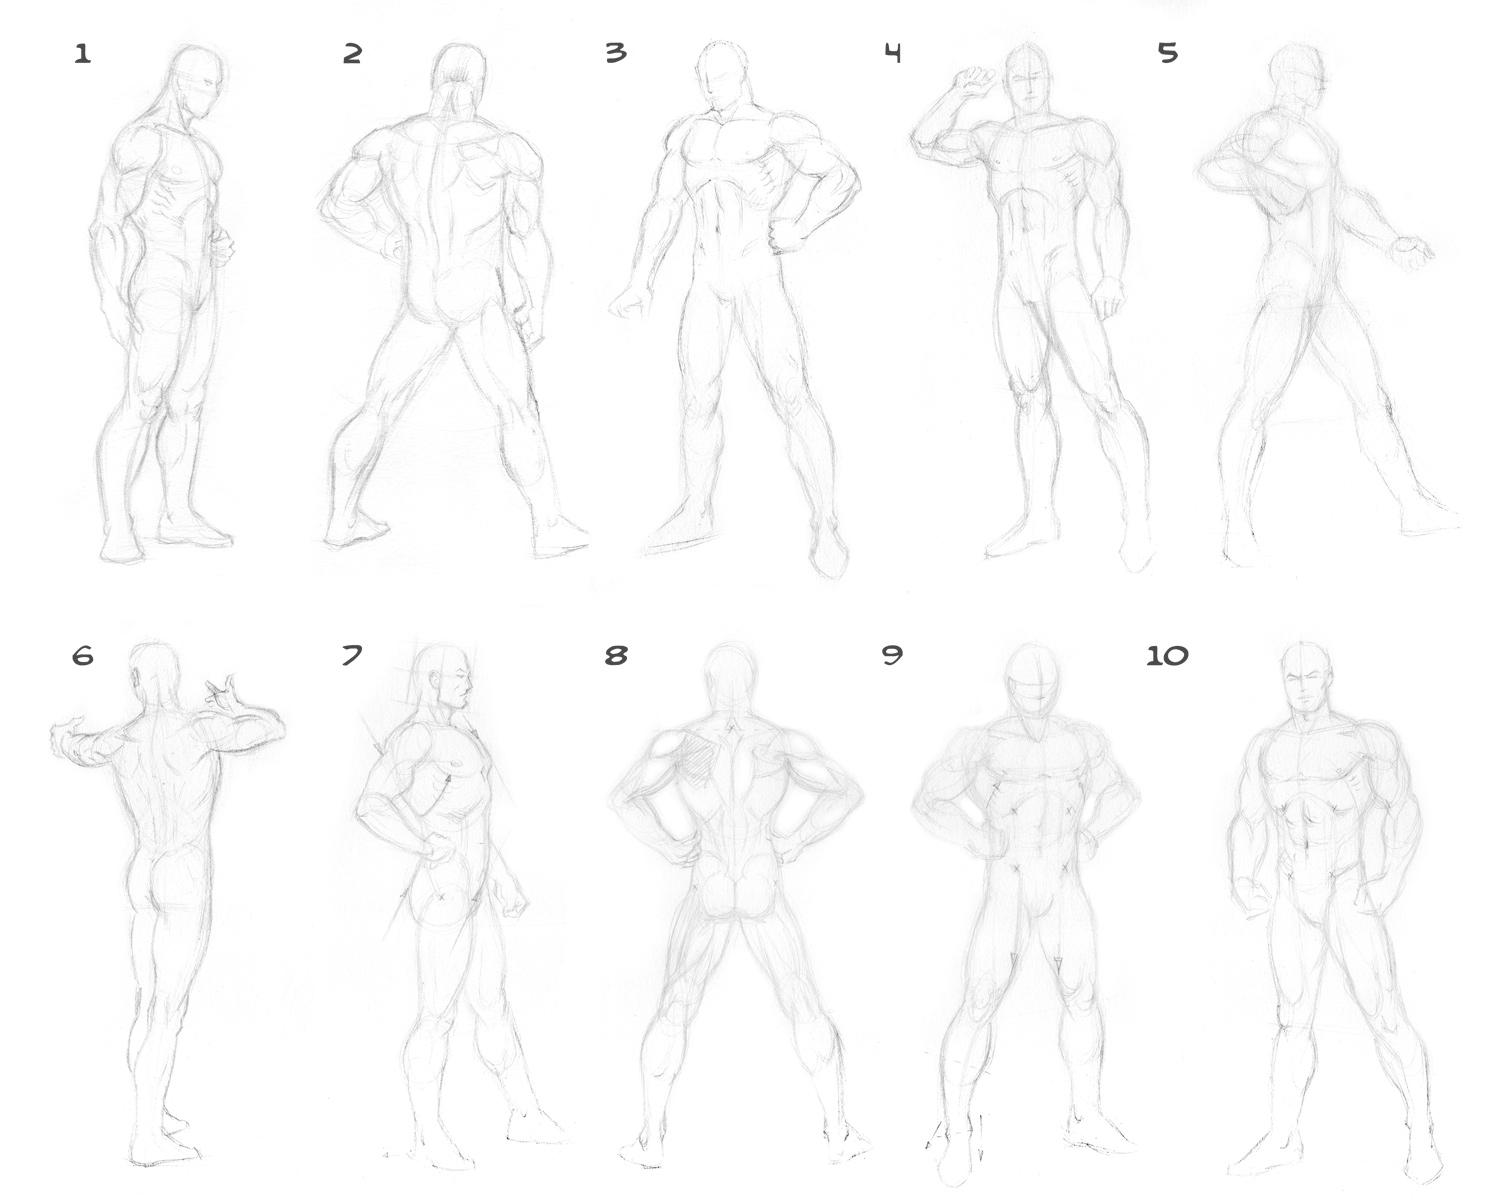 anime male poses